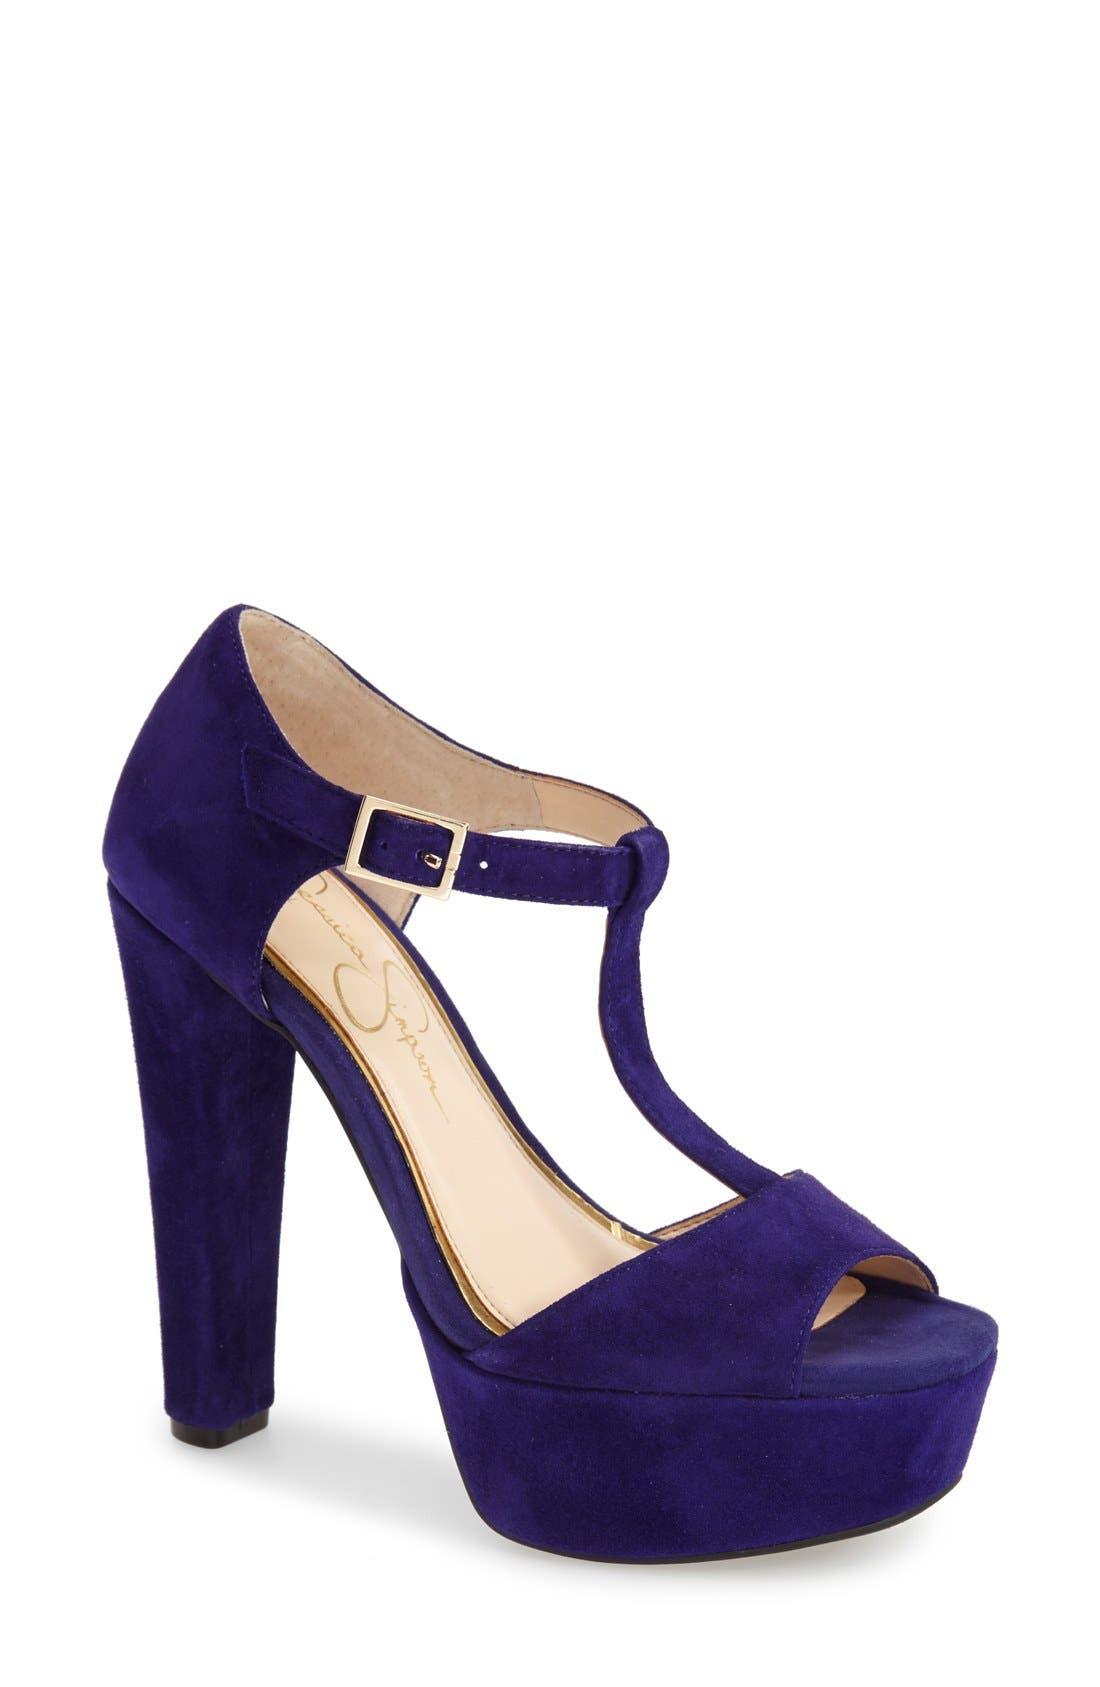 Alternate Image 1 Selected - Jessica Simpson 'Adelinah' T-Strap Platform Sandal (Women)